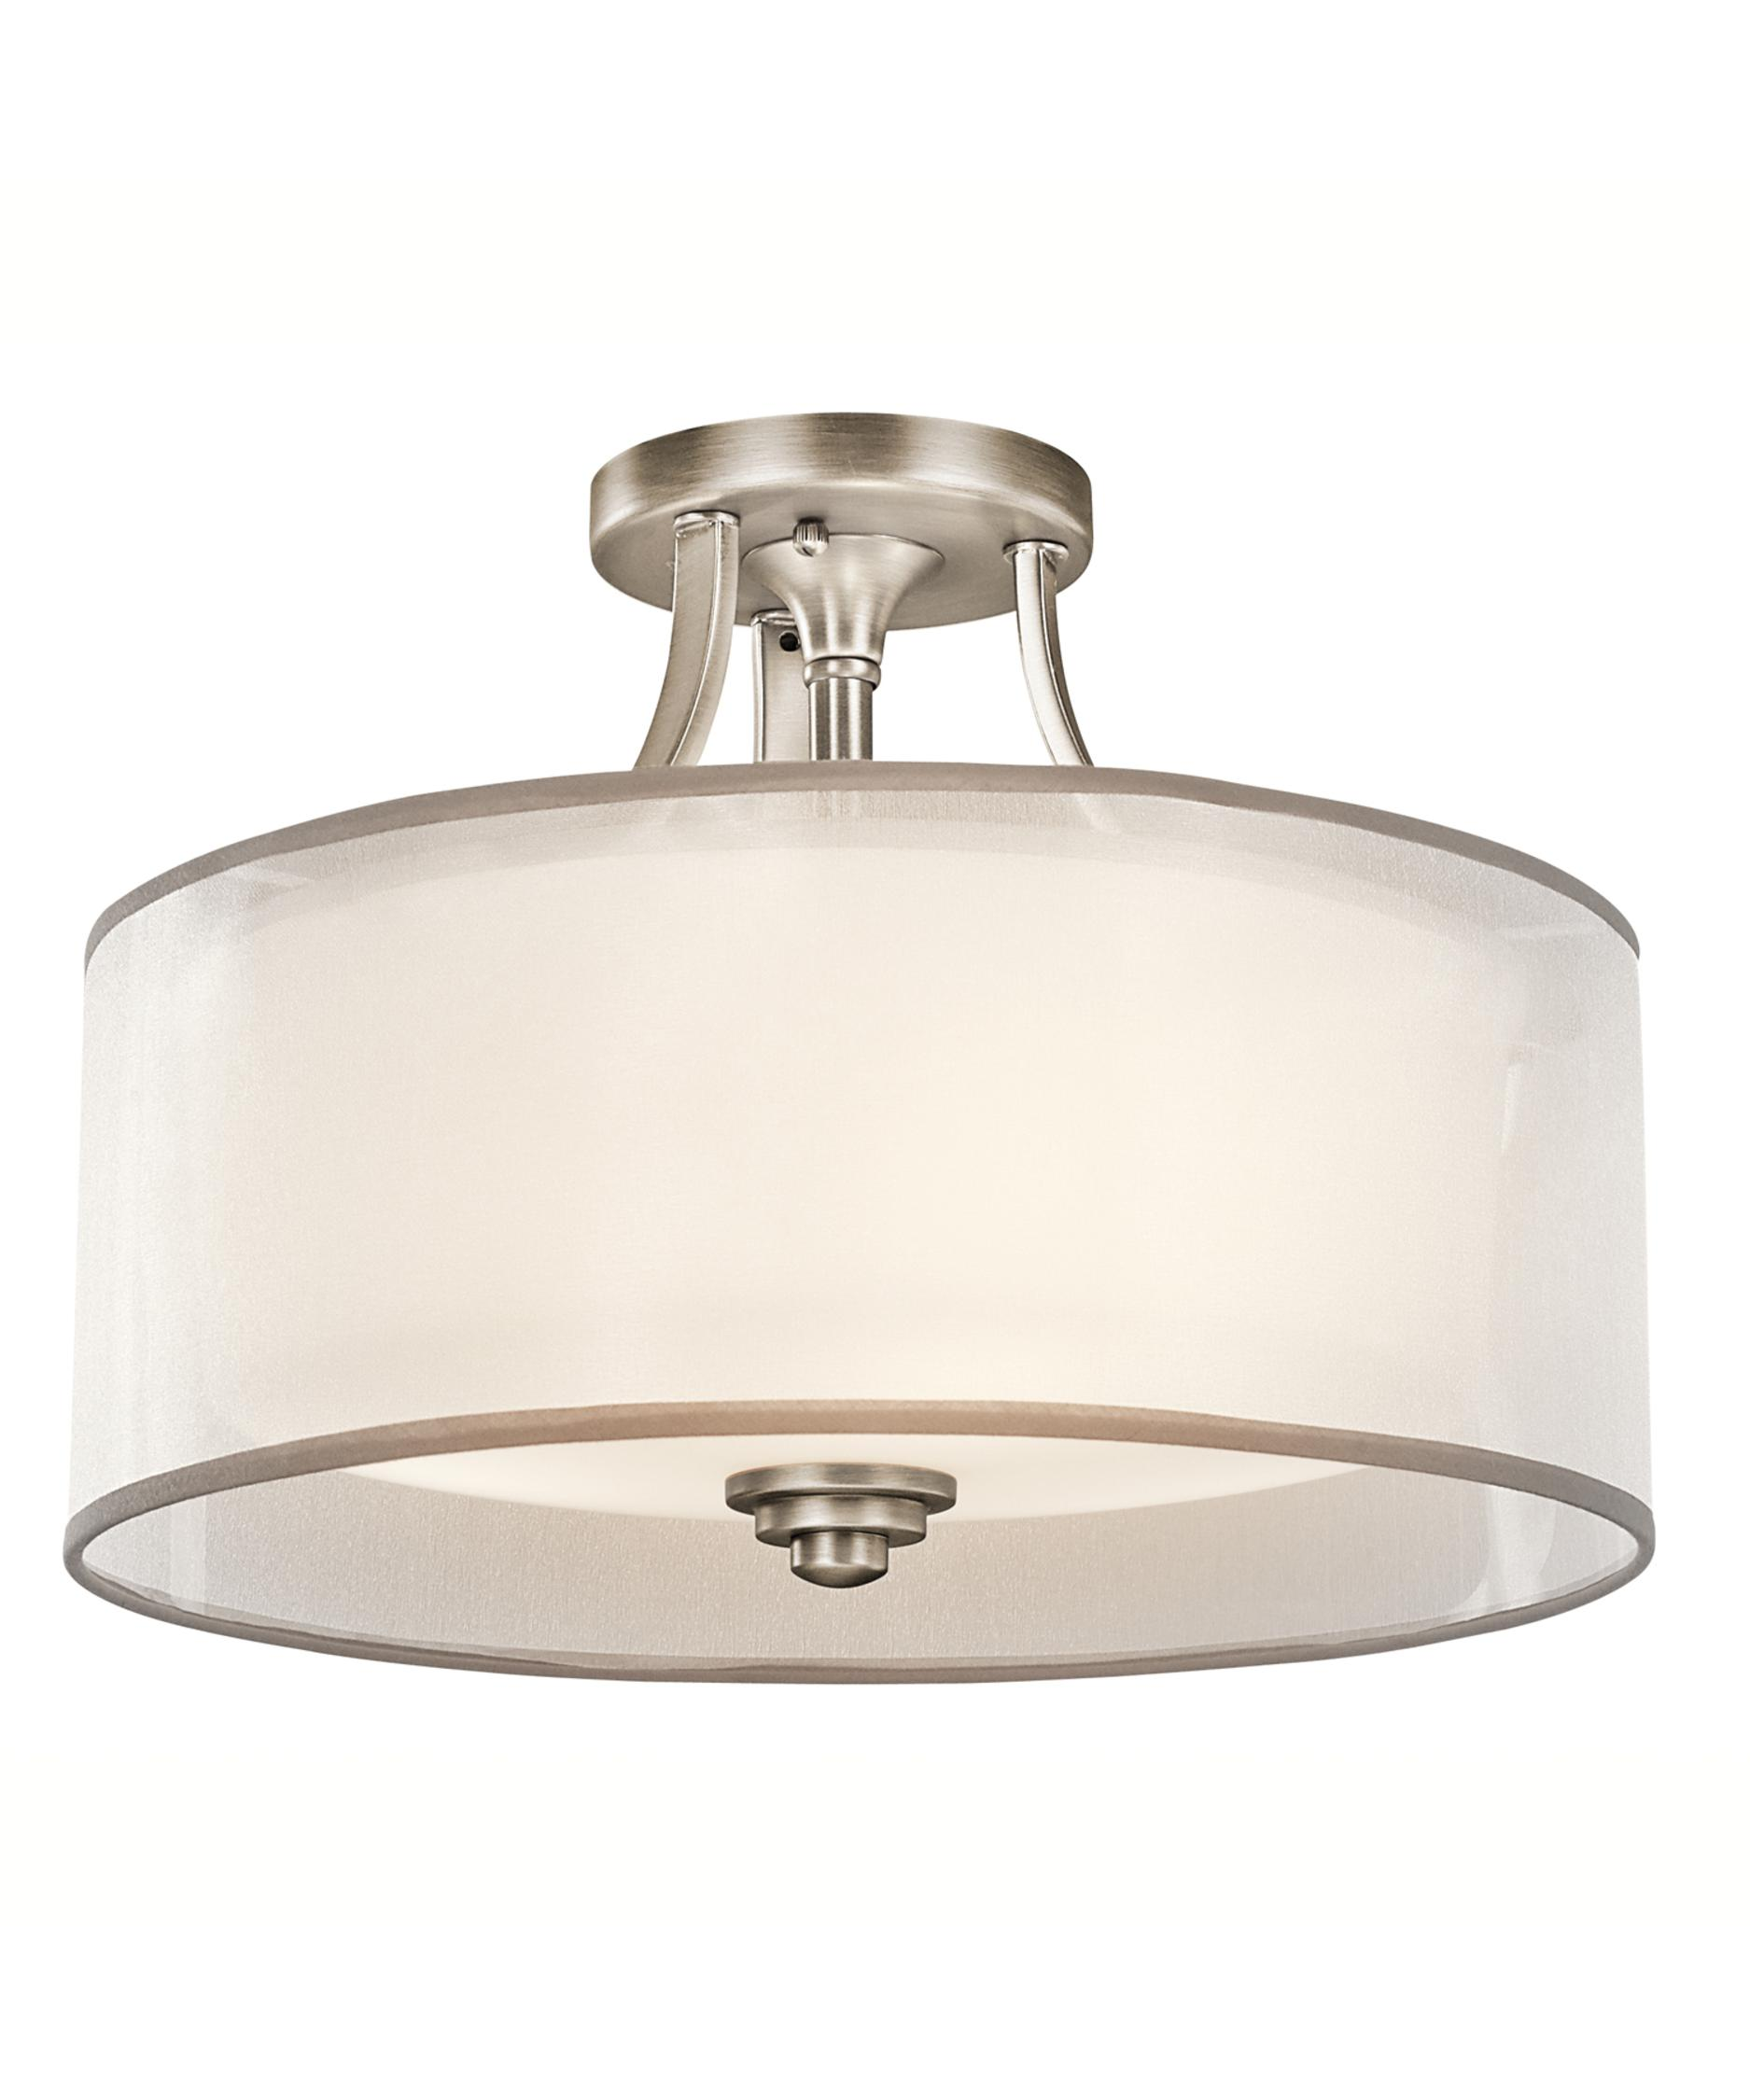 Kichler Lighting Kitchen Lighting Kichler Lacey 15 Inch Wide Semi Flush Mount Capitol Lighting 1